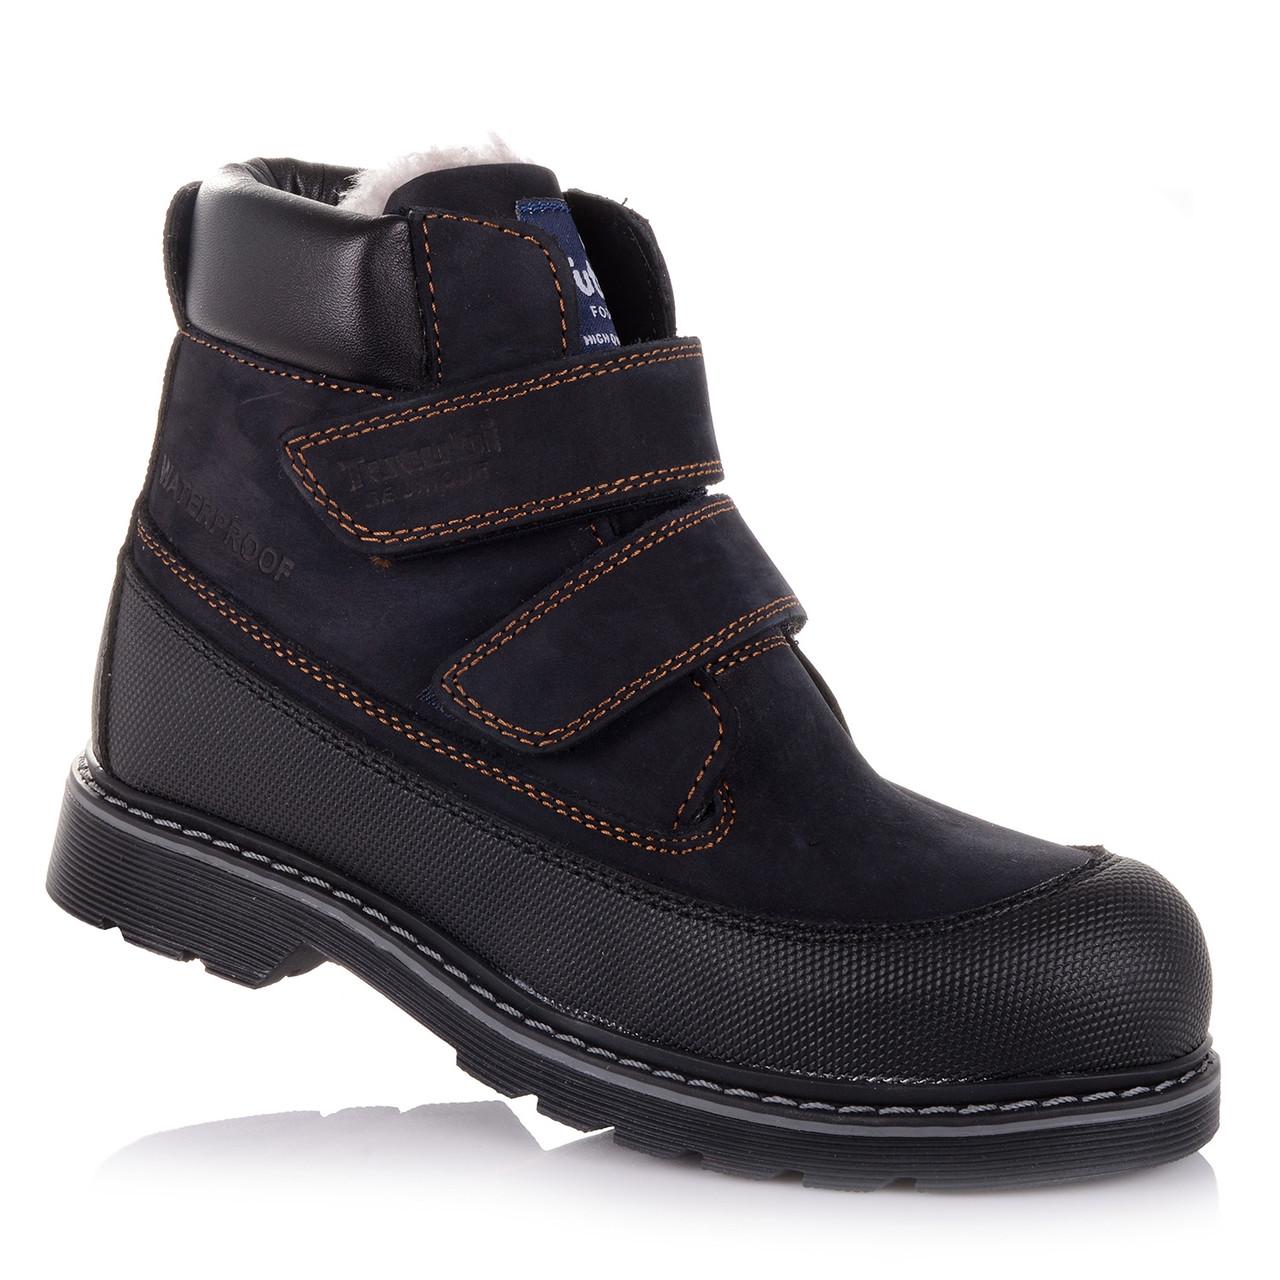 d1515fe00 Зимняя обувь для мальчиков Tutubi 11.4.259 (26-40), цена 1 270 грн ...